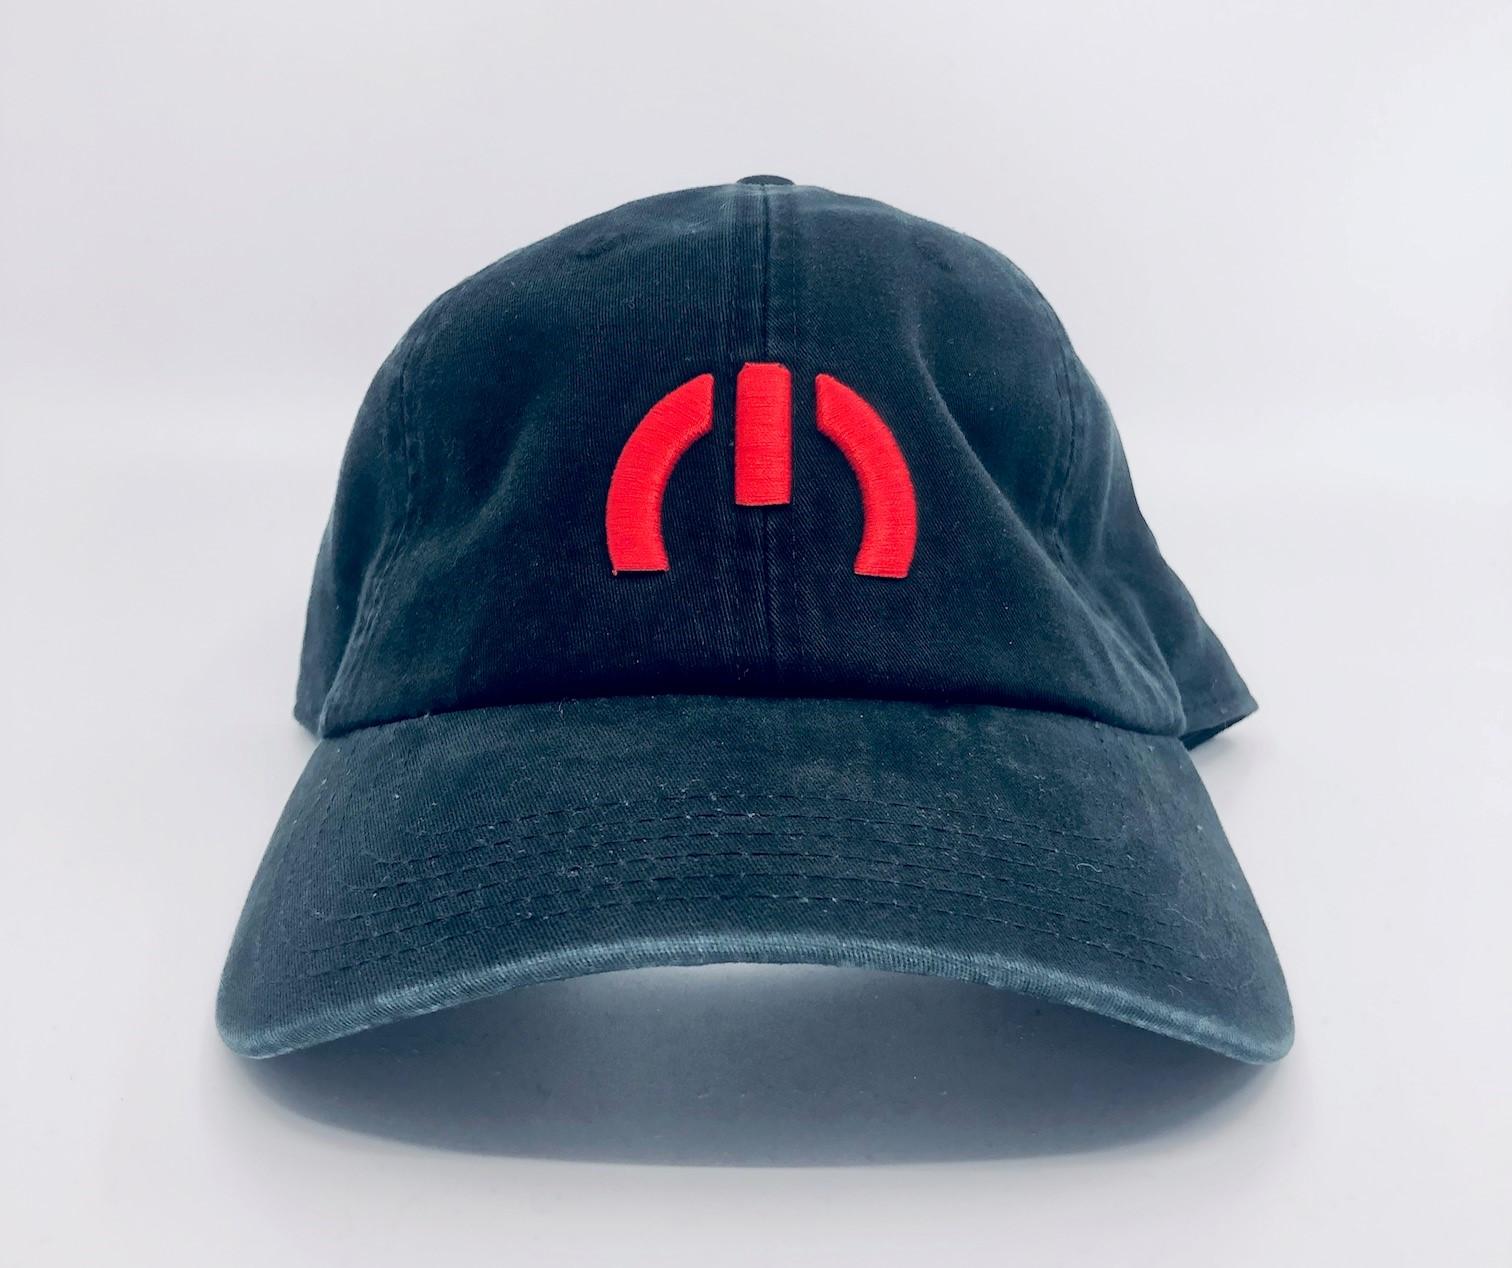 logounltd_laser_etching_embroidery_screen_printing_apparel_uniform_custom_tshirts_t_shirt_kirkland_bellevue_seattle_redmond_woodinville_branded_merchandise_promotional_products_logo_unltd_magnix_hats (1).jpg